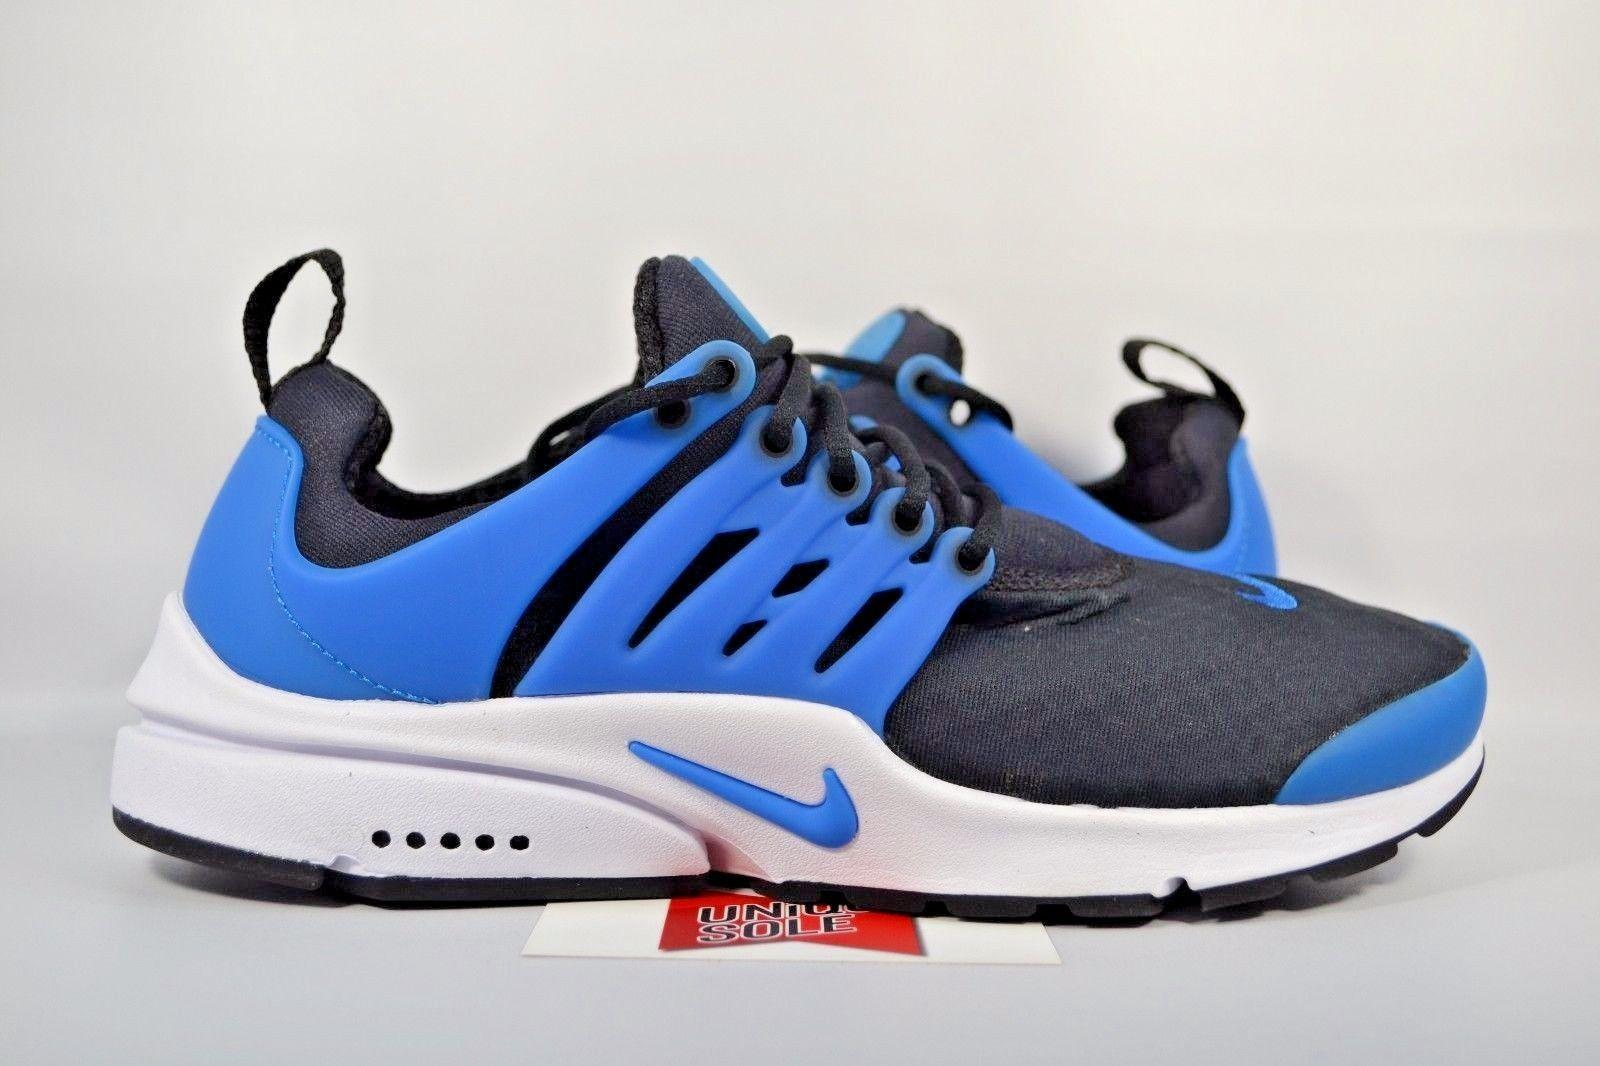 FTS77002960 Size 12 United States Nike Women / Men 2017 Nike Air Max Tavas Essential Photo Blue/Pht Blue Gm Royal White Shoes USA / US Size 8 5